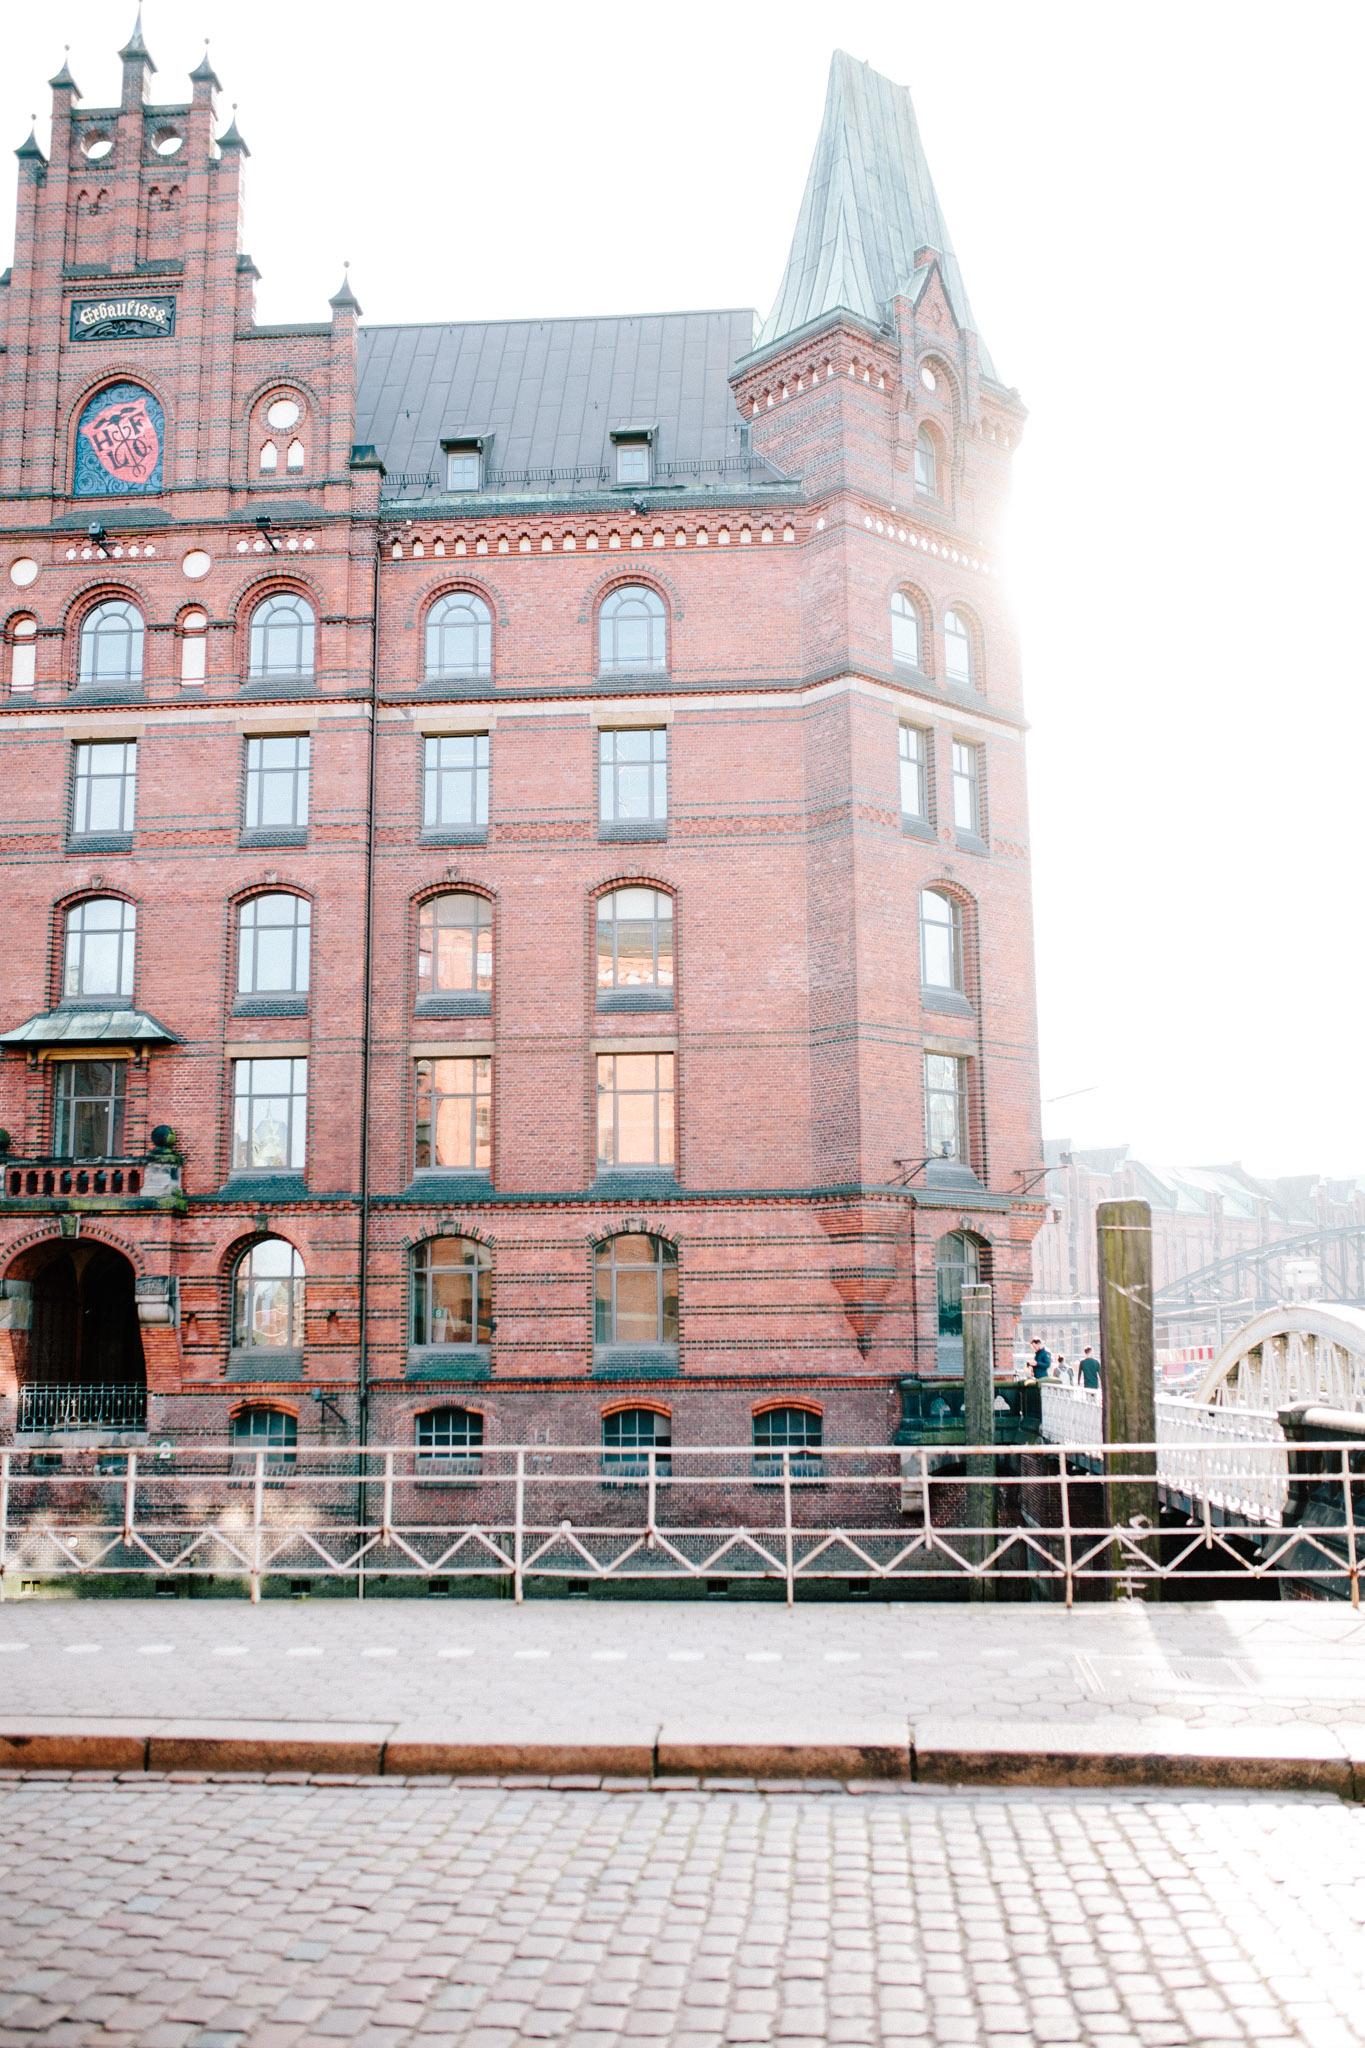 Speicherstadt-Hamburg-Engagement-Pia-Anna-Christian-Wedding-Photography-RJ-5.jpg